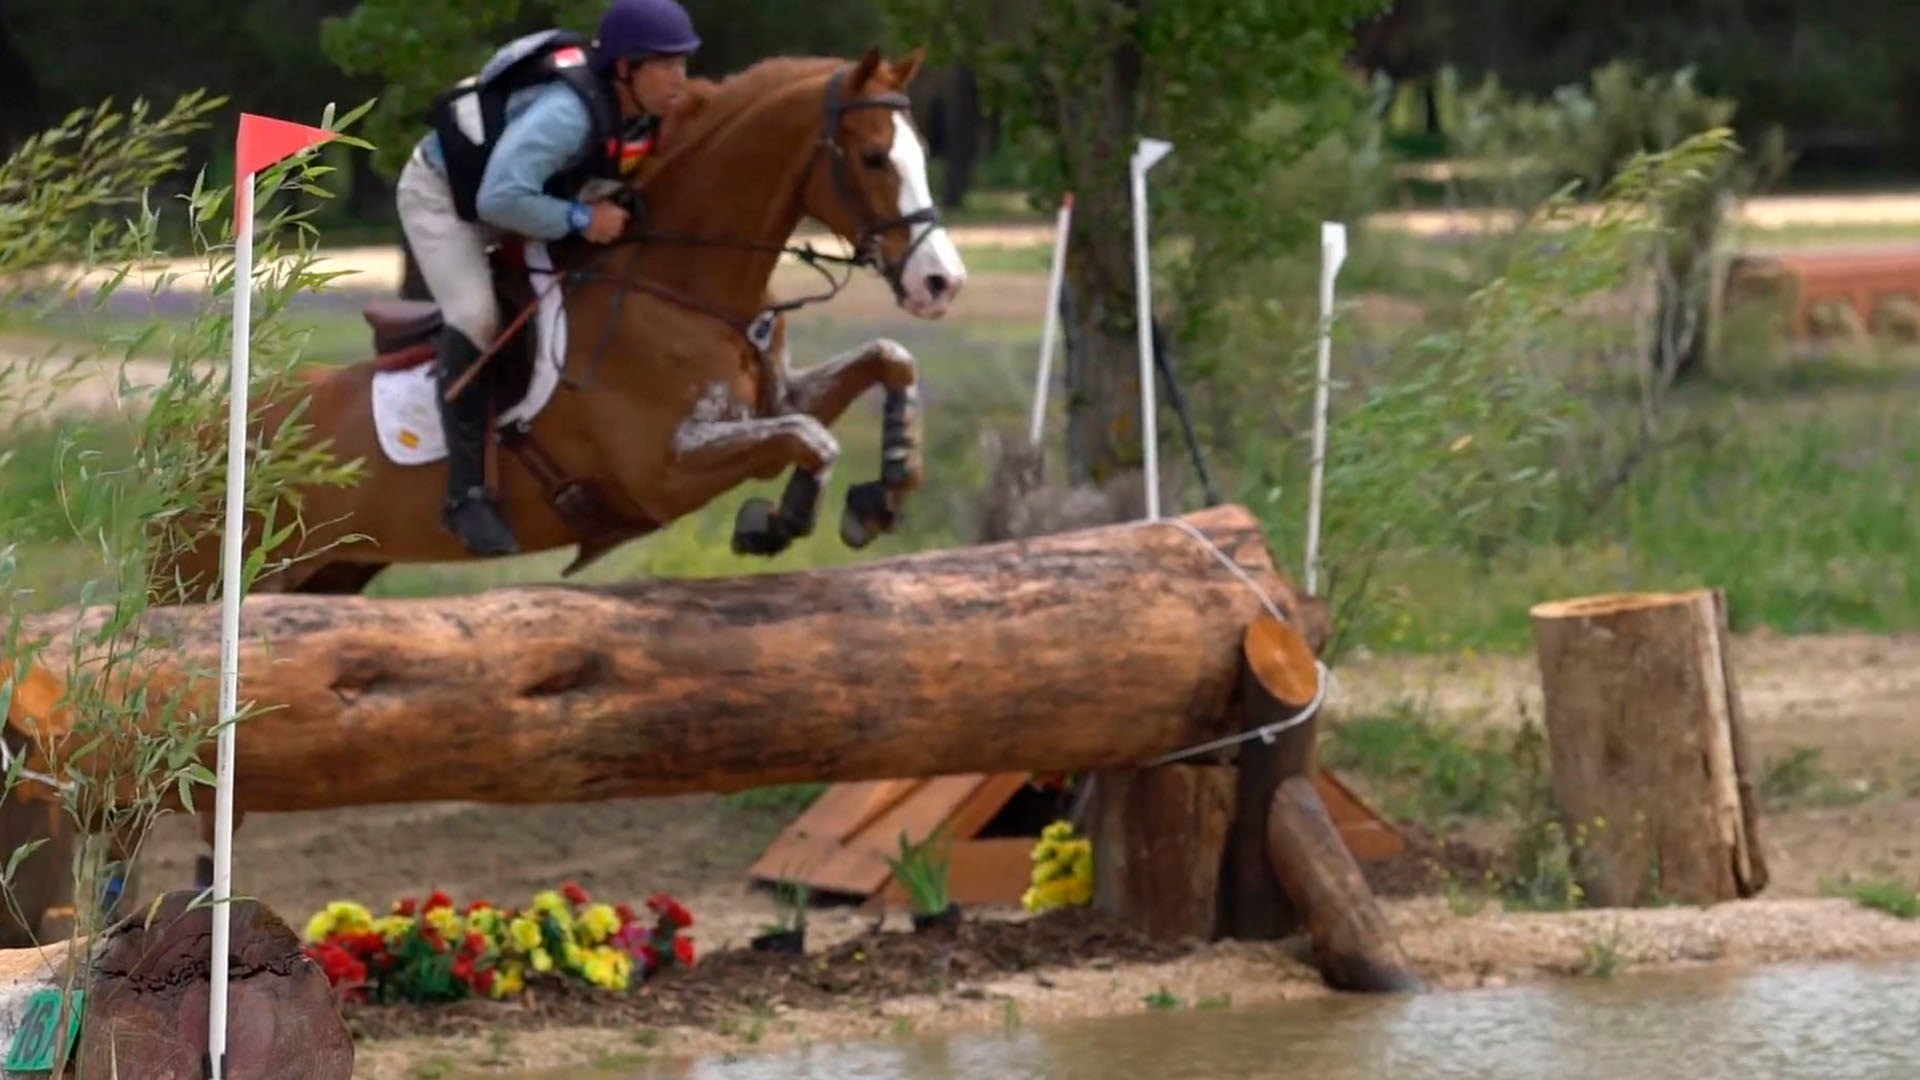 Concurso Completo de Equitación